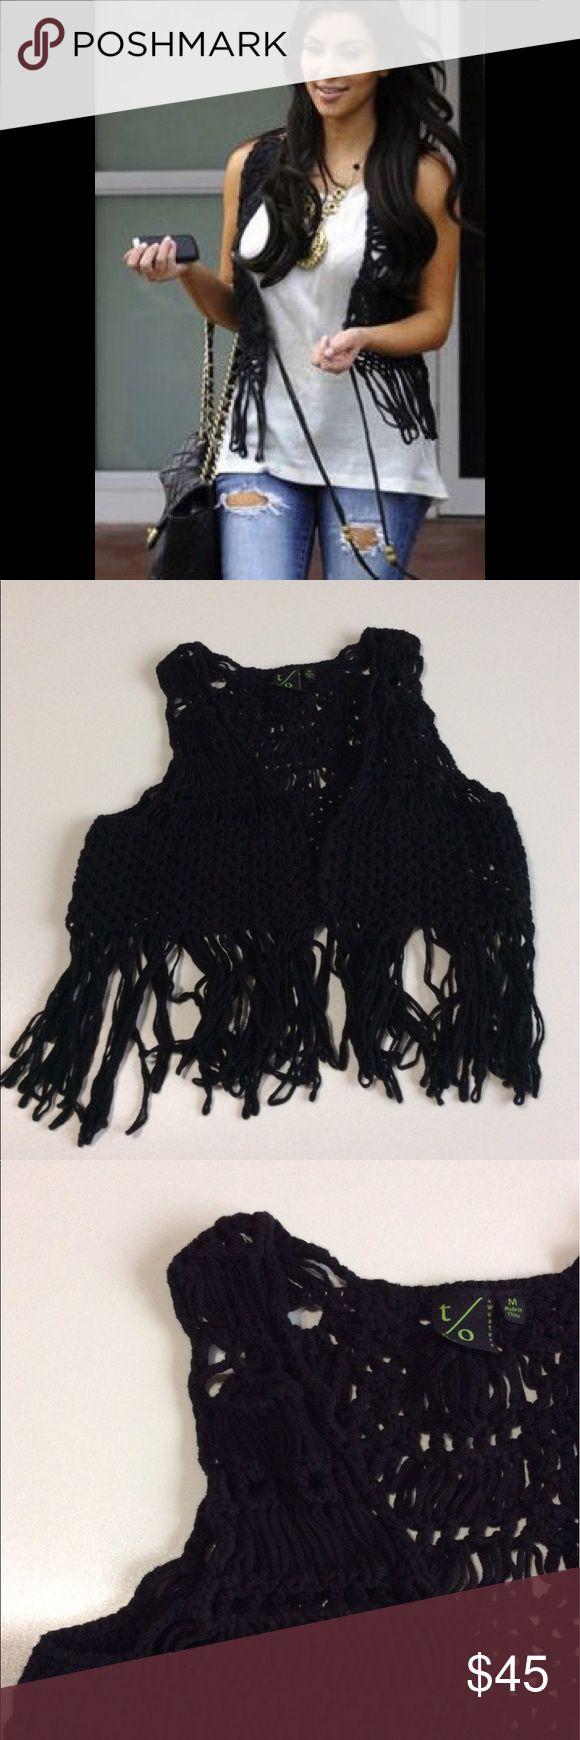 Kim K Style Black Crochet Fringe Vest 💕 Super cute Size Medium black Crochet Fringe vest! It fits like a Small/Medium. Good condition! Purchased at a boutique!💋 boutique Jackets & Coats Vests